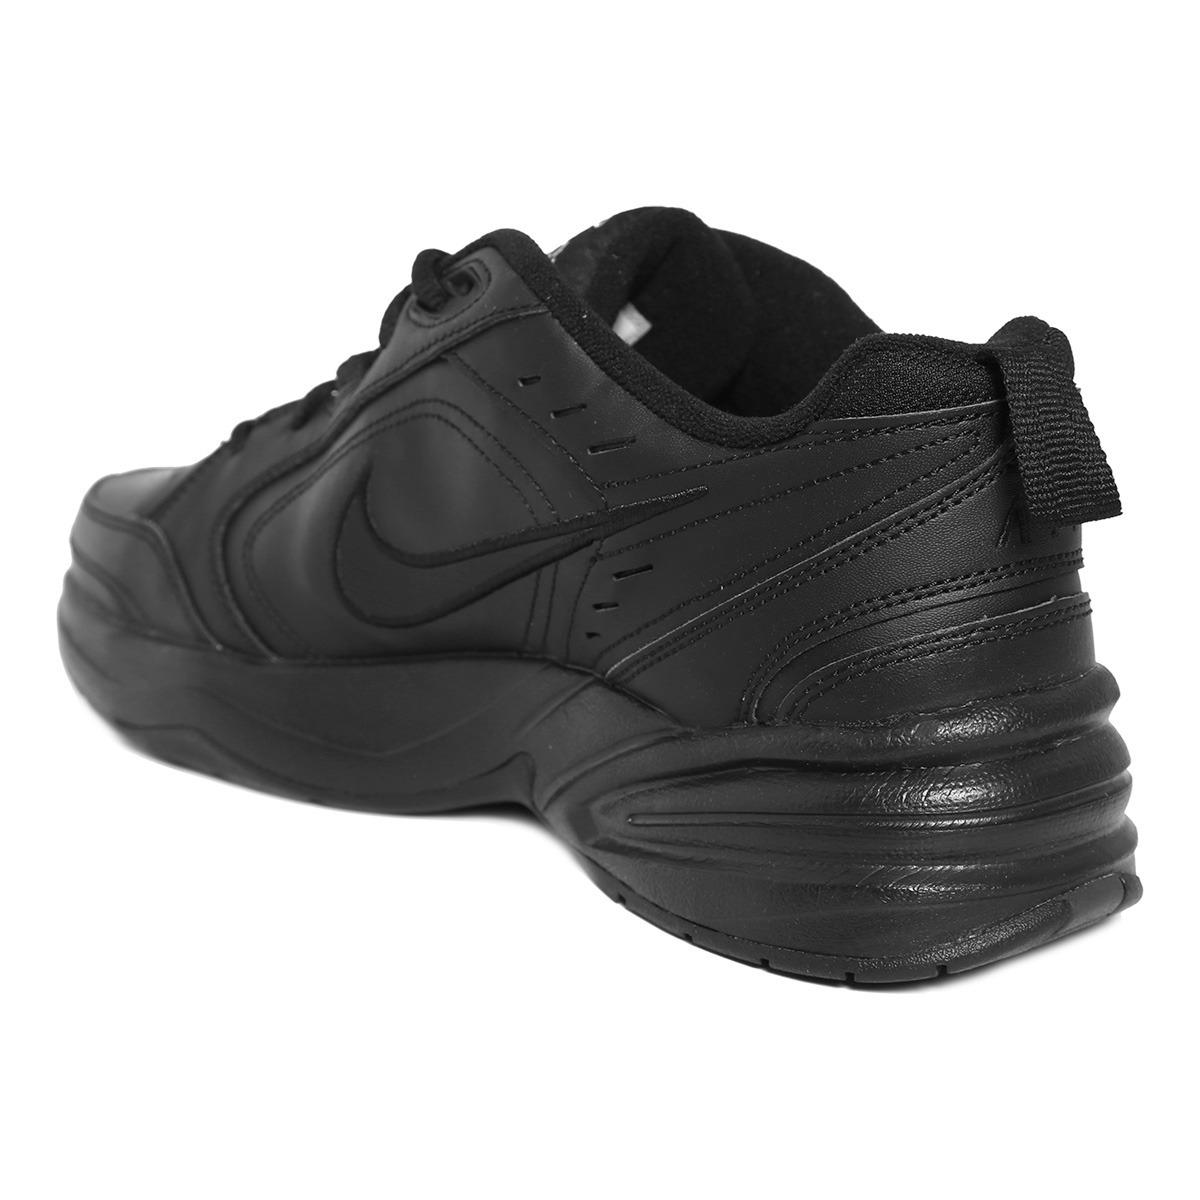 bb6b8b28fcbe4 Tenis Nike Air Monarch Iv Para Hombre Color Negro 2578804 ...